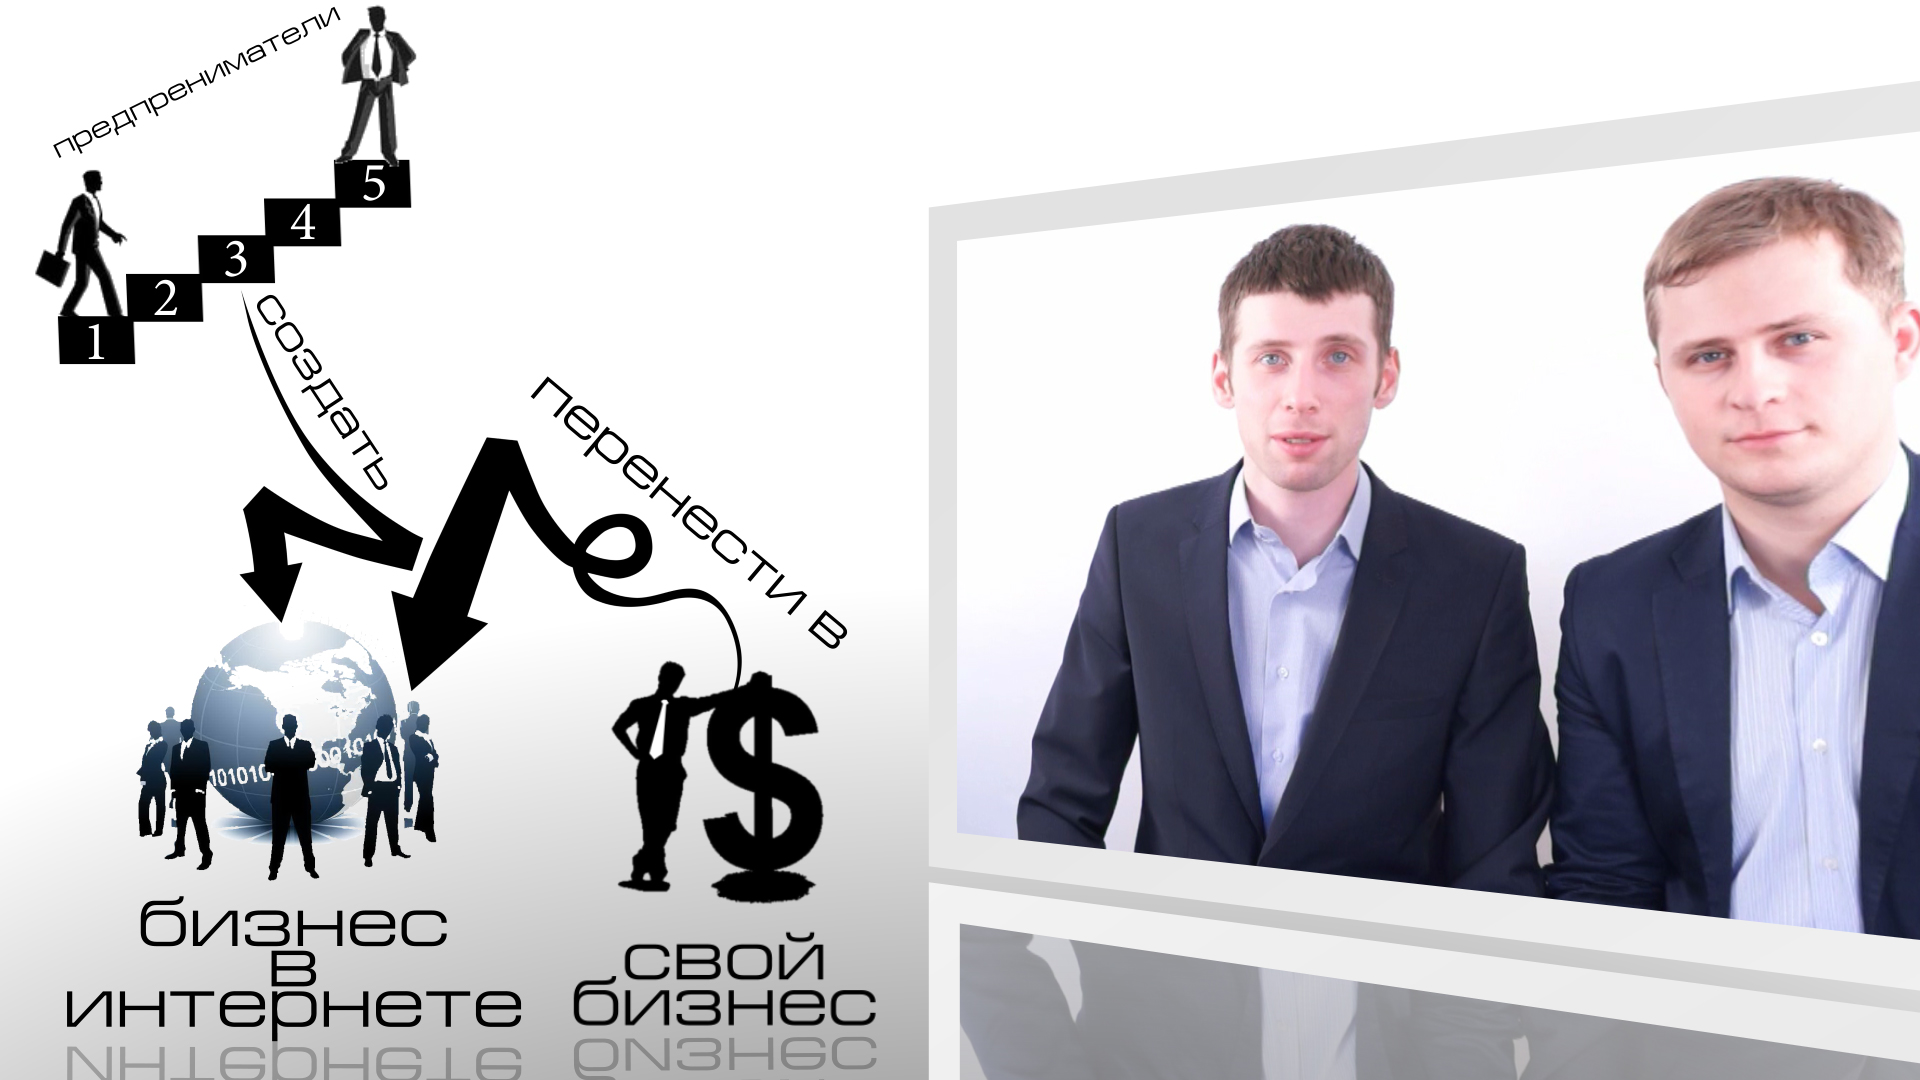 Information video